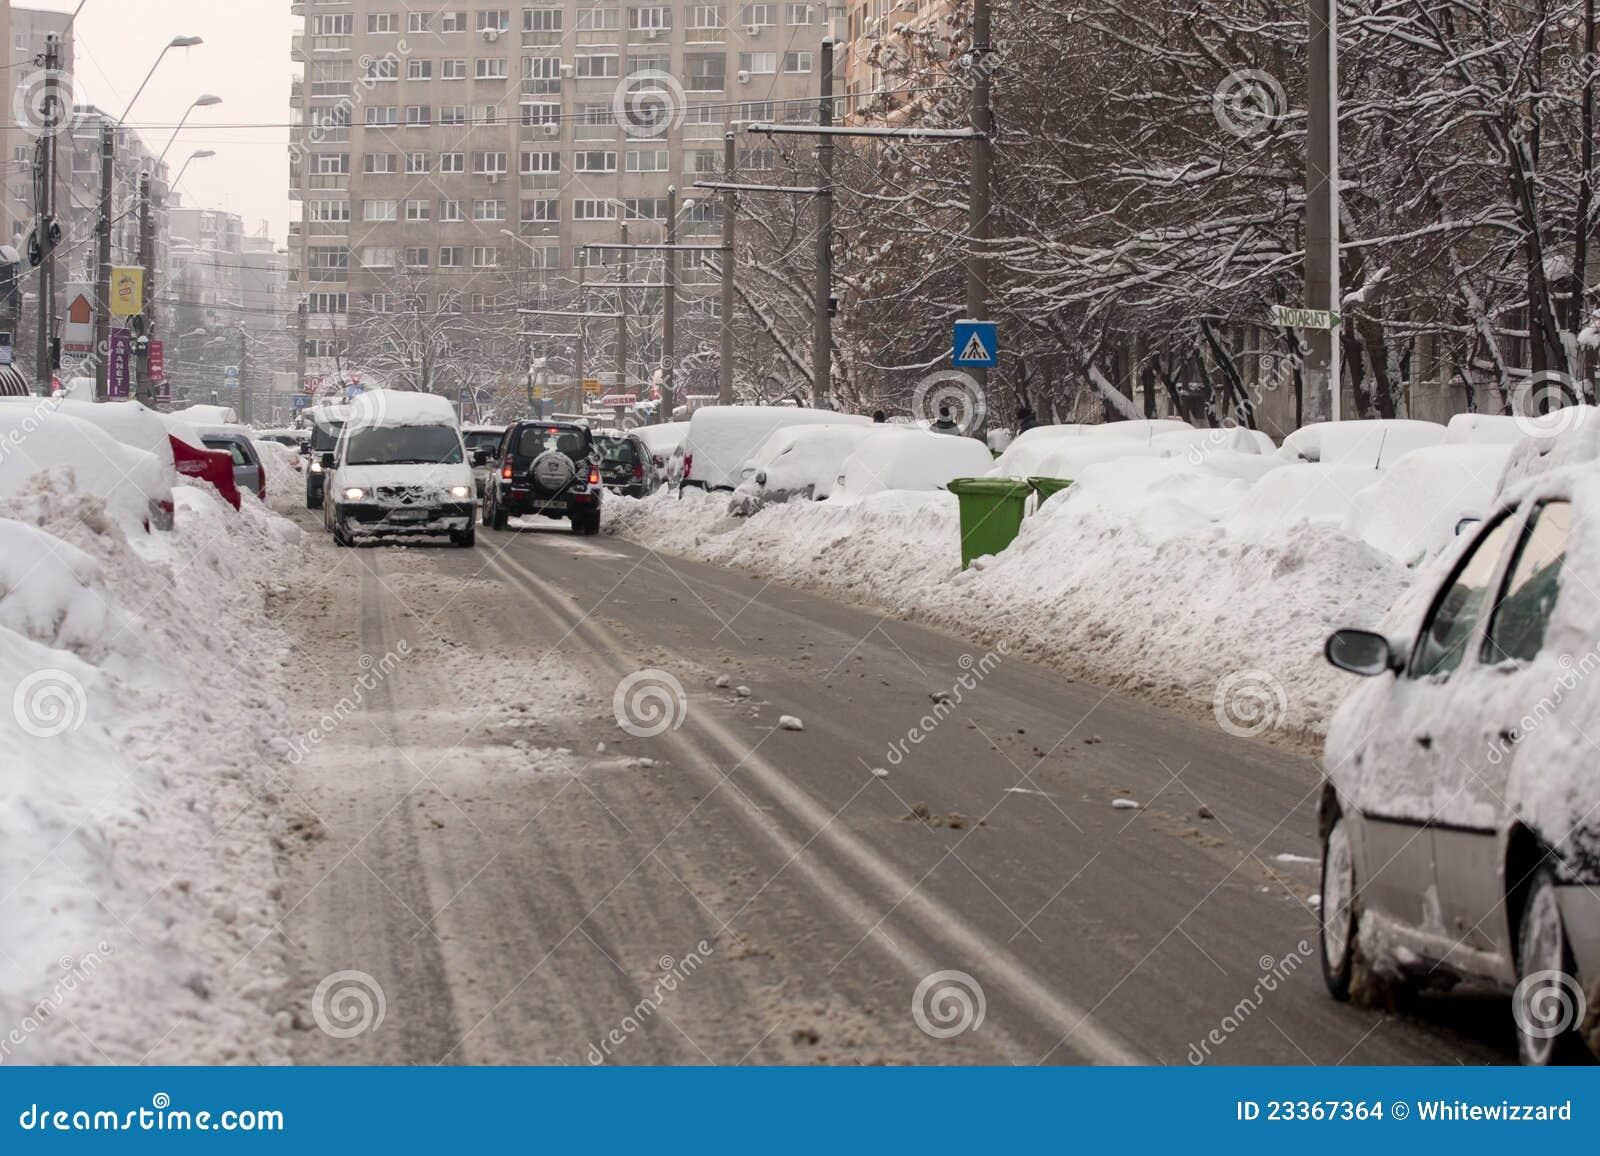 Bucharest Romania February 14 Weather Anomalies Editorial Stock Image Image Of Anomalies Freeze 23367364